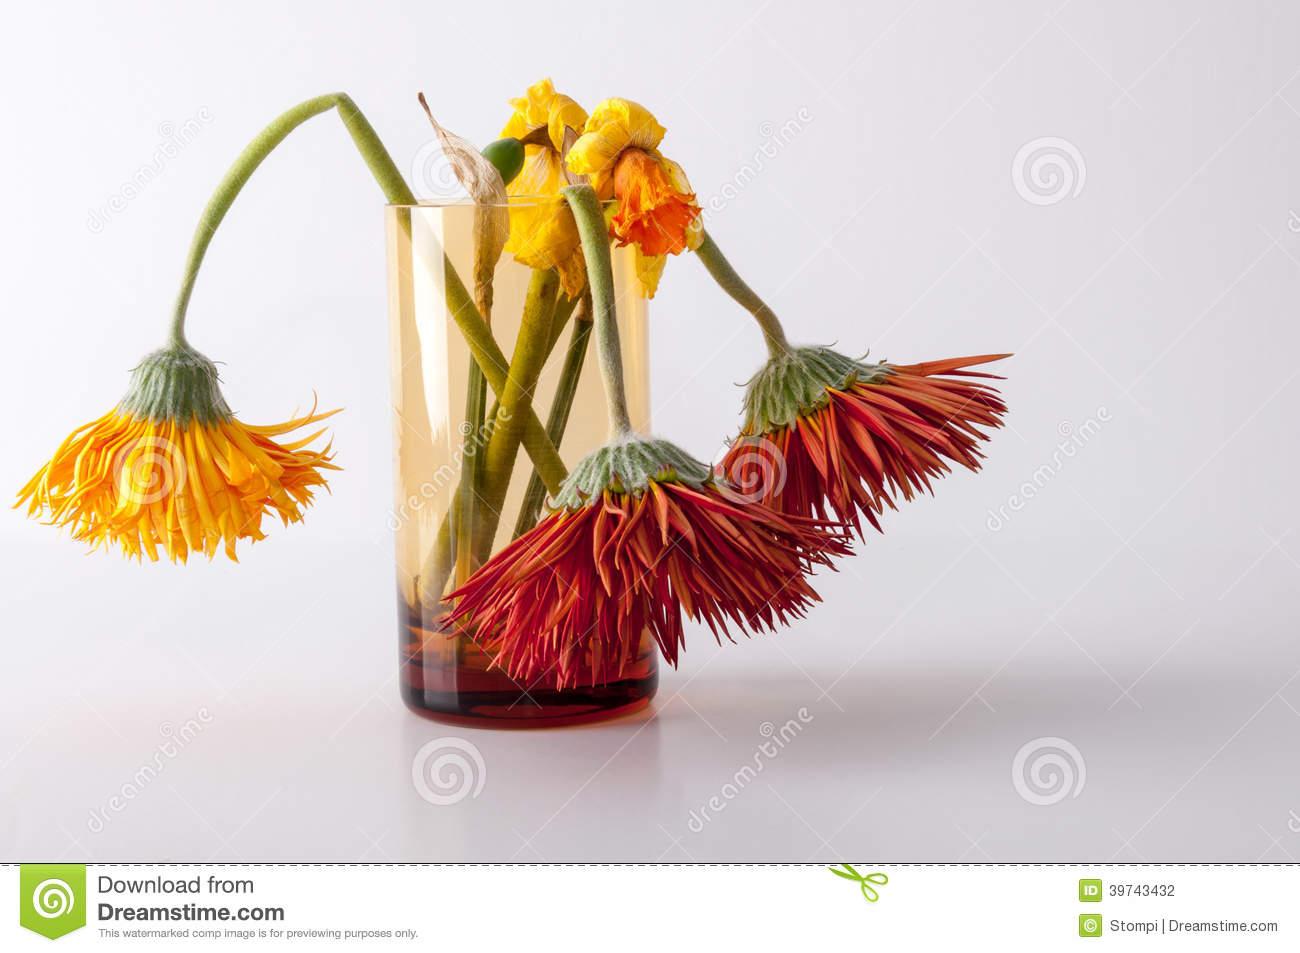 fiori-appassiti-39743432